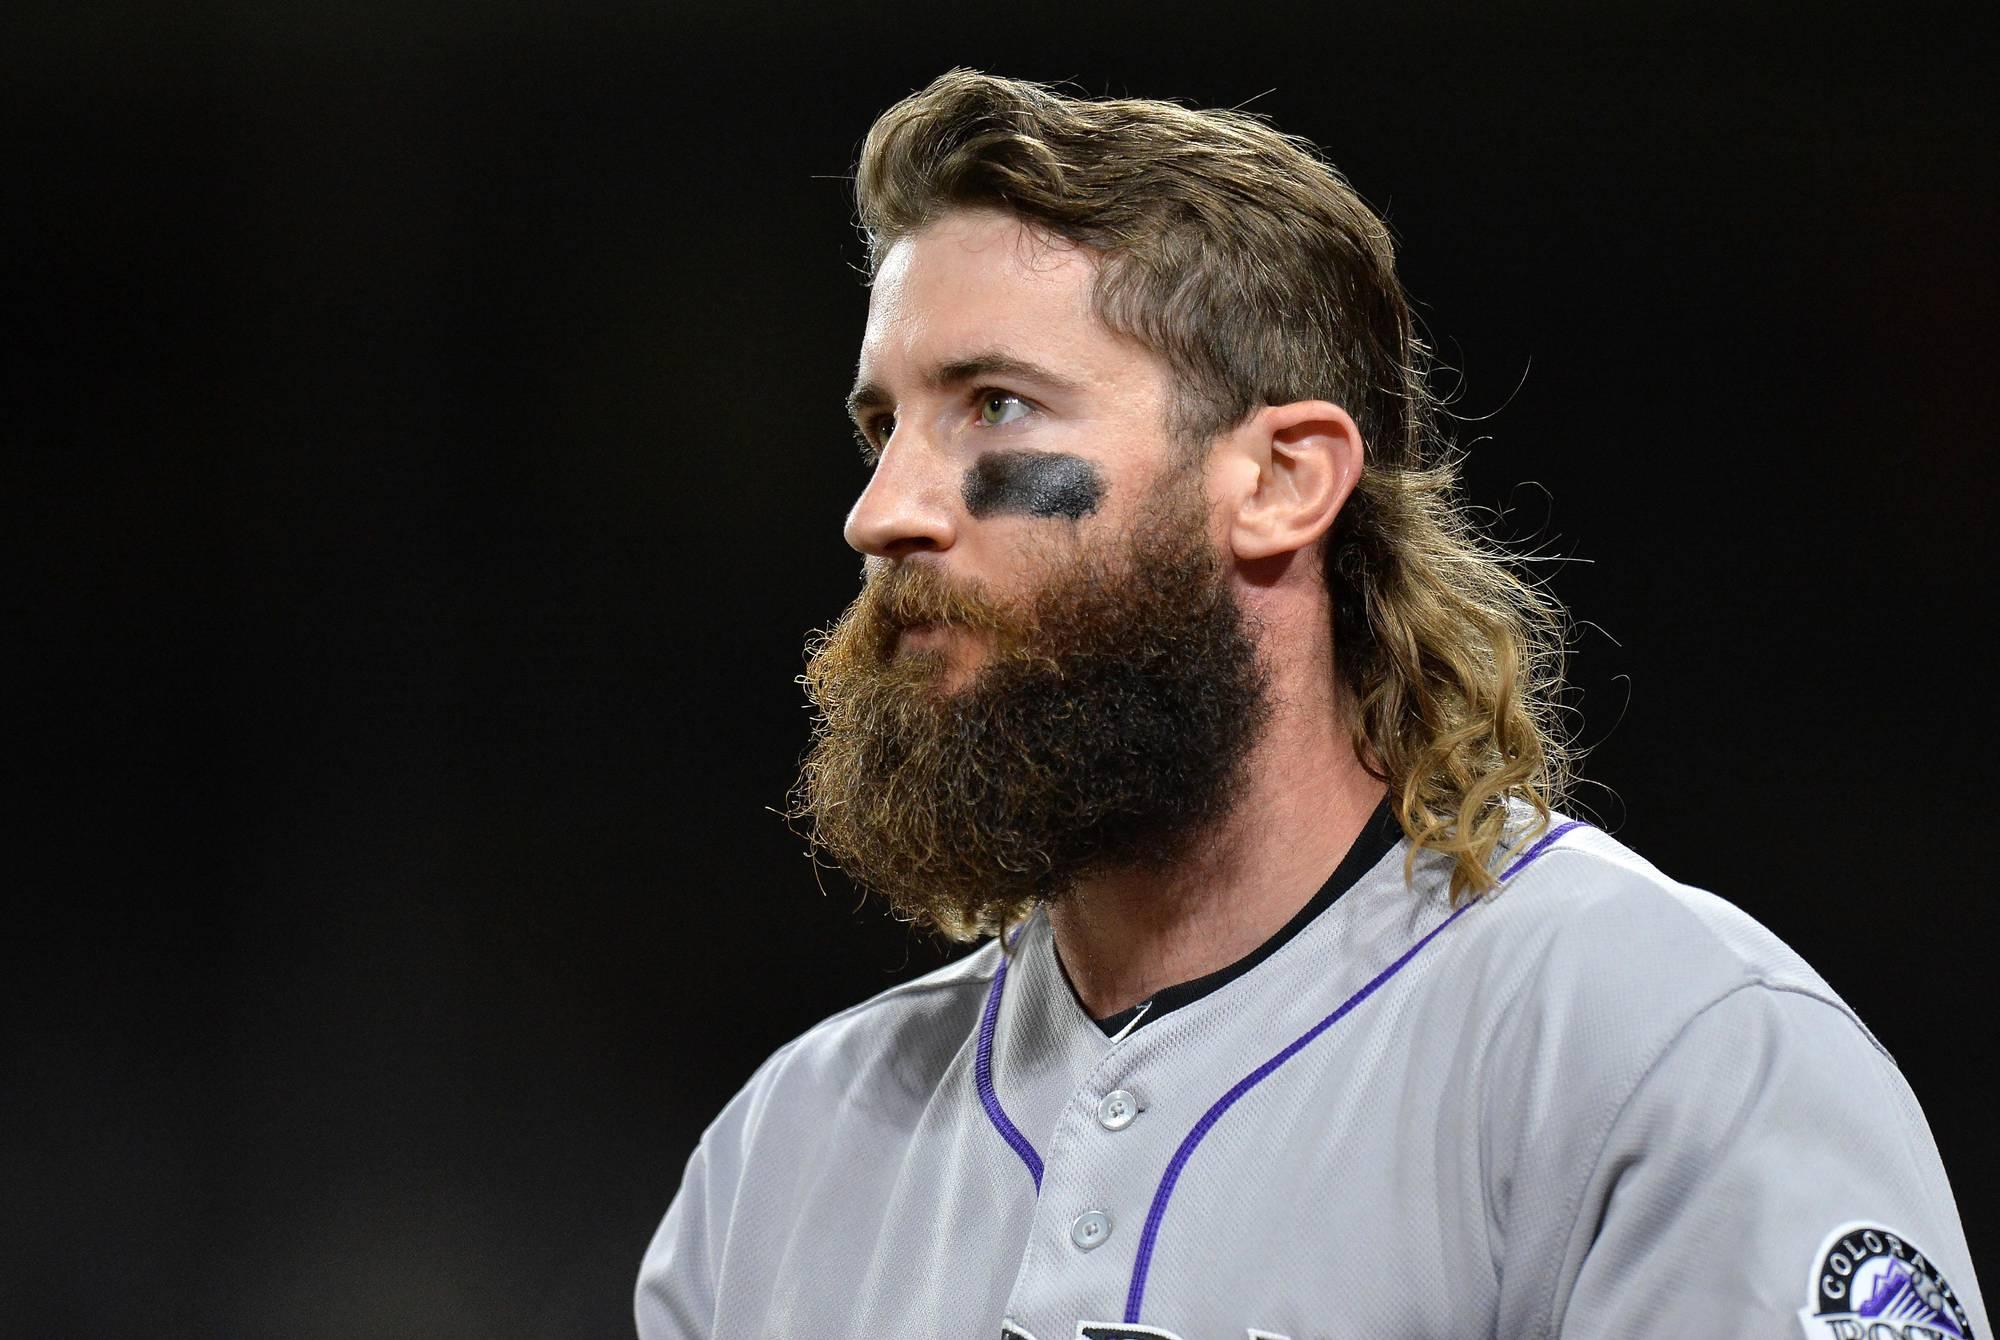 Reactions from baseball world to Charlie Blackmon's ...